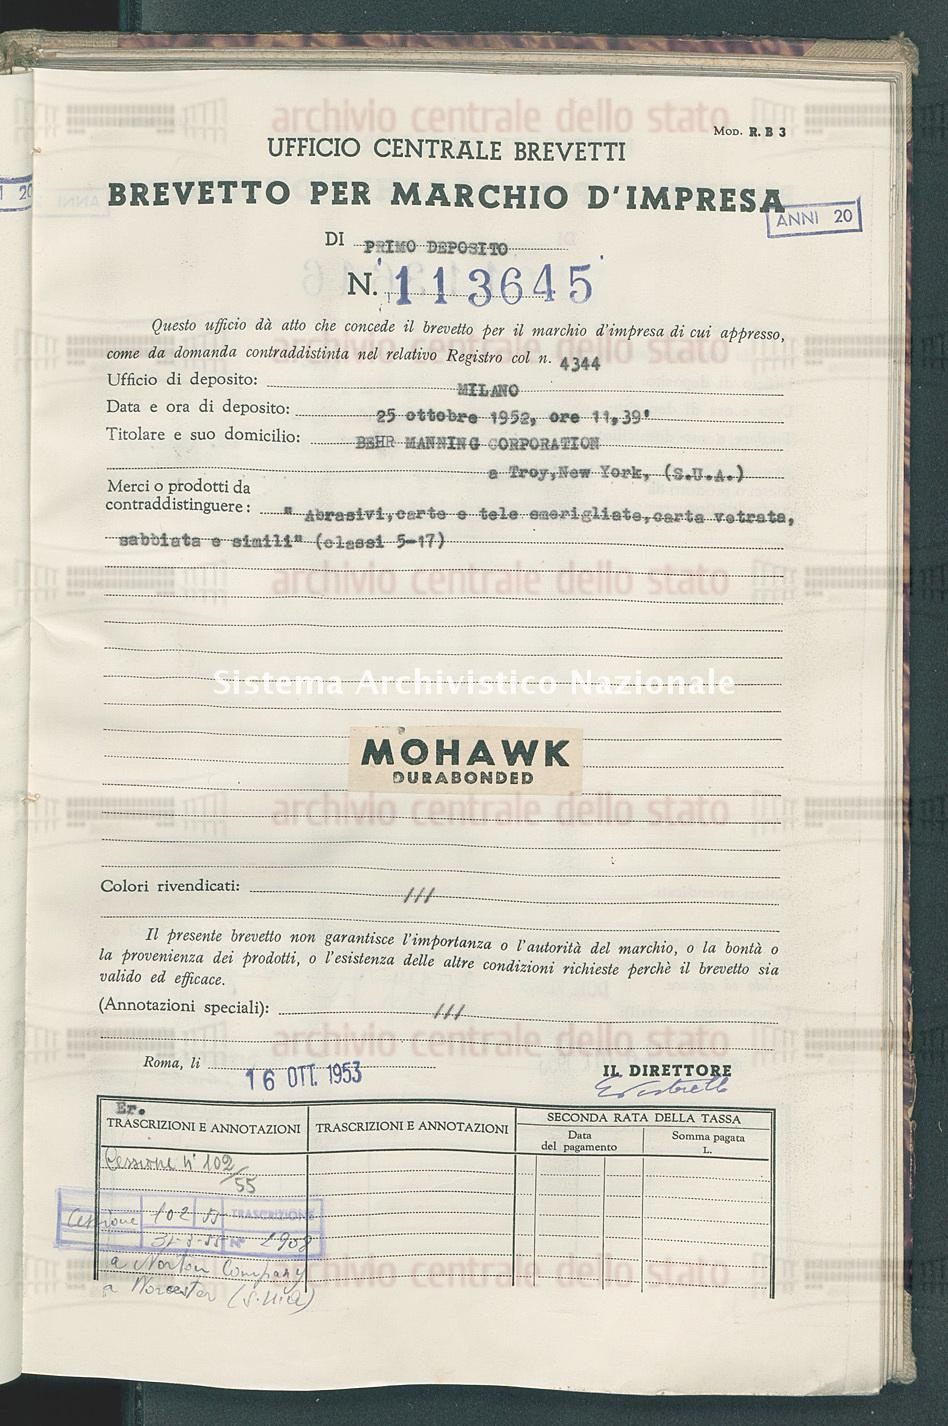 'Abrasivi, carta e tele smerigliate, carta vetrata, sabbiata e simili' Behr Manning Corporation (16/10/1953)